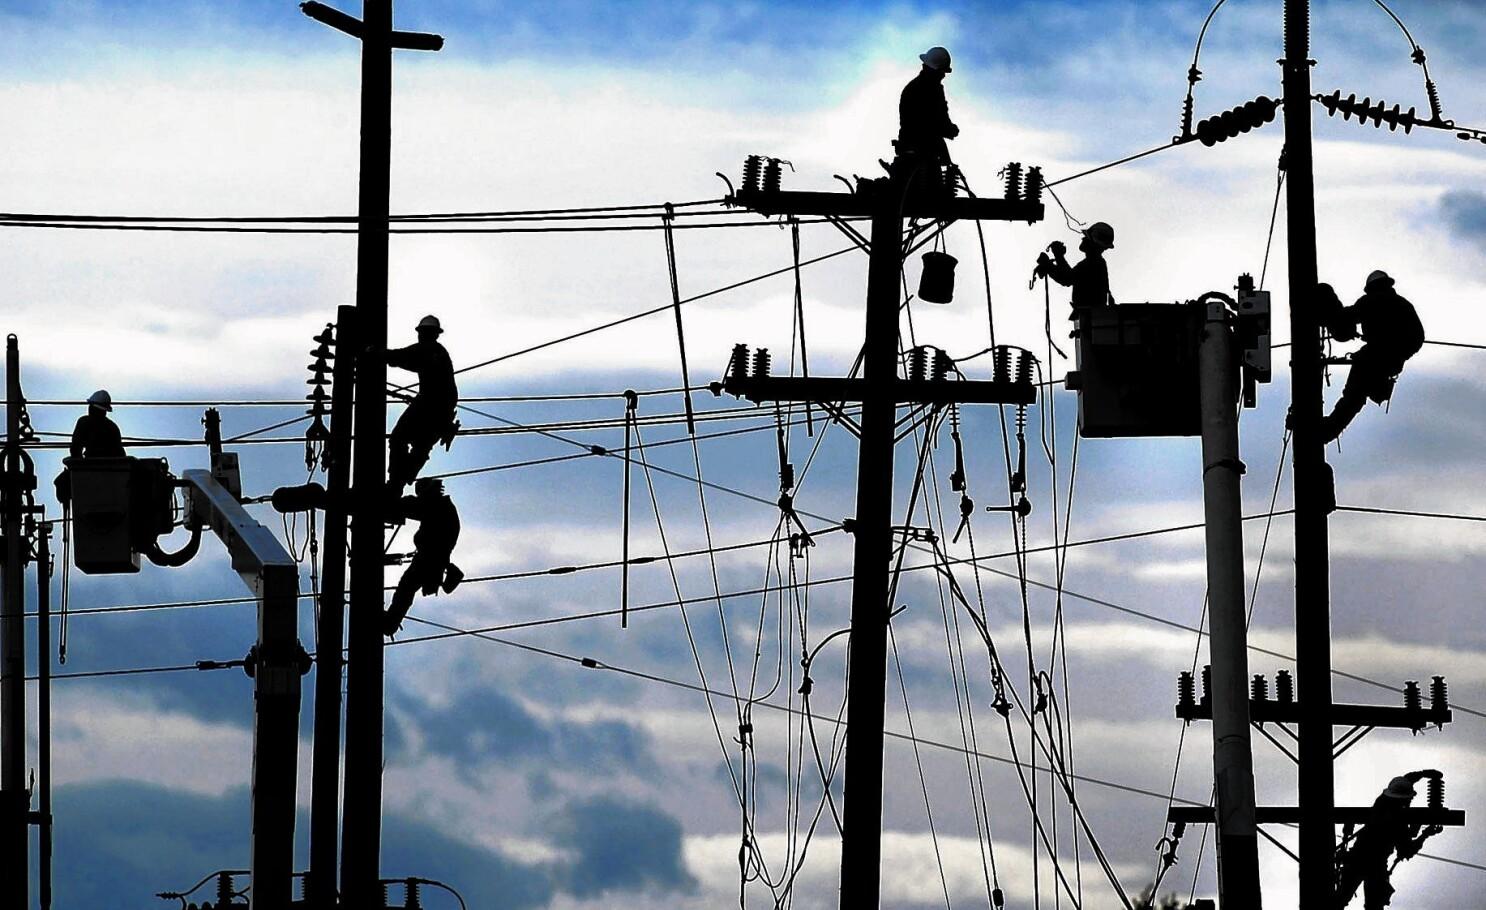 PG&E deserved rebuke by Newsom, state regulator over mass power outage